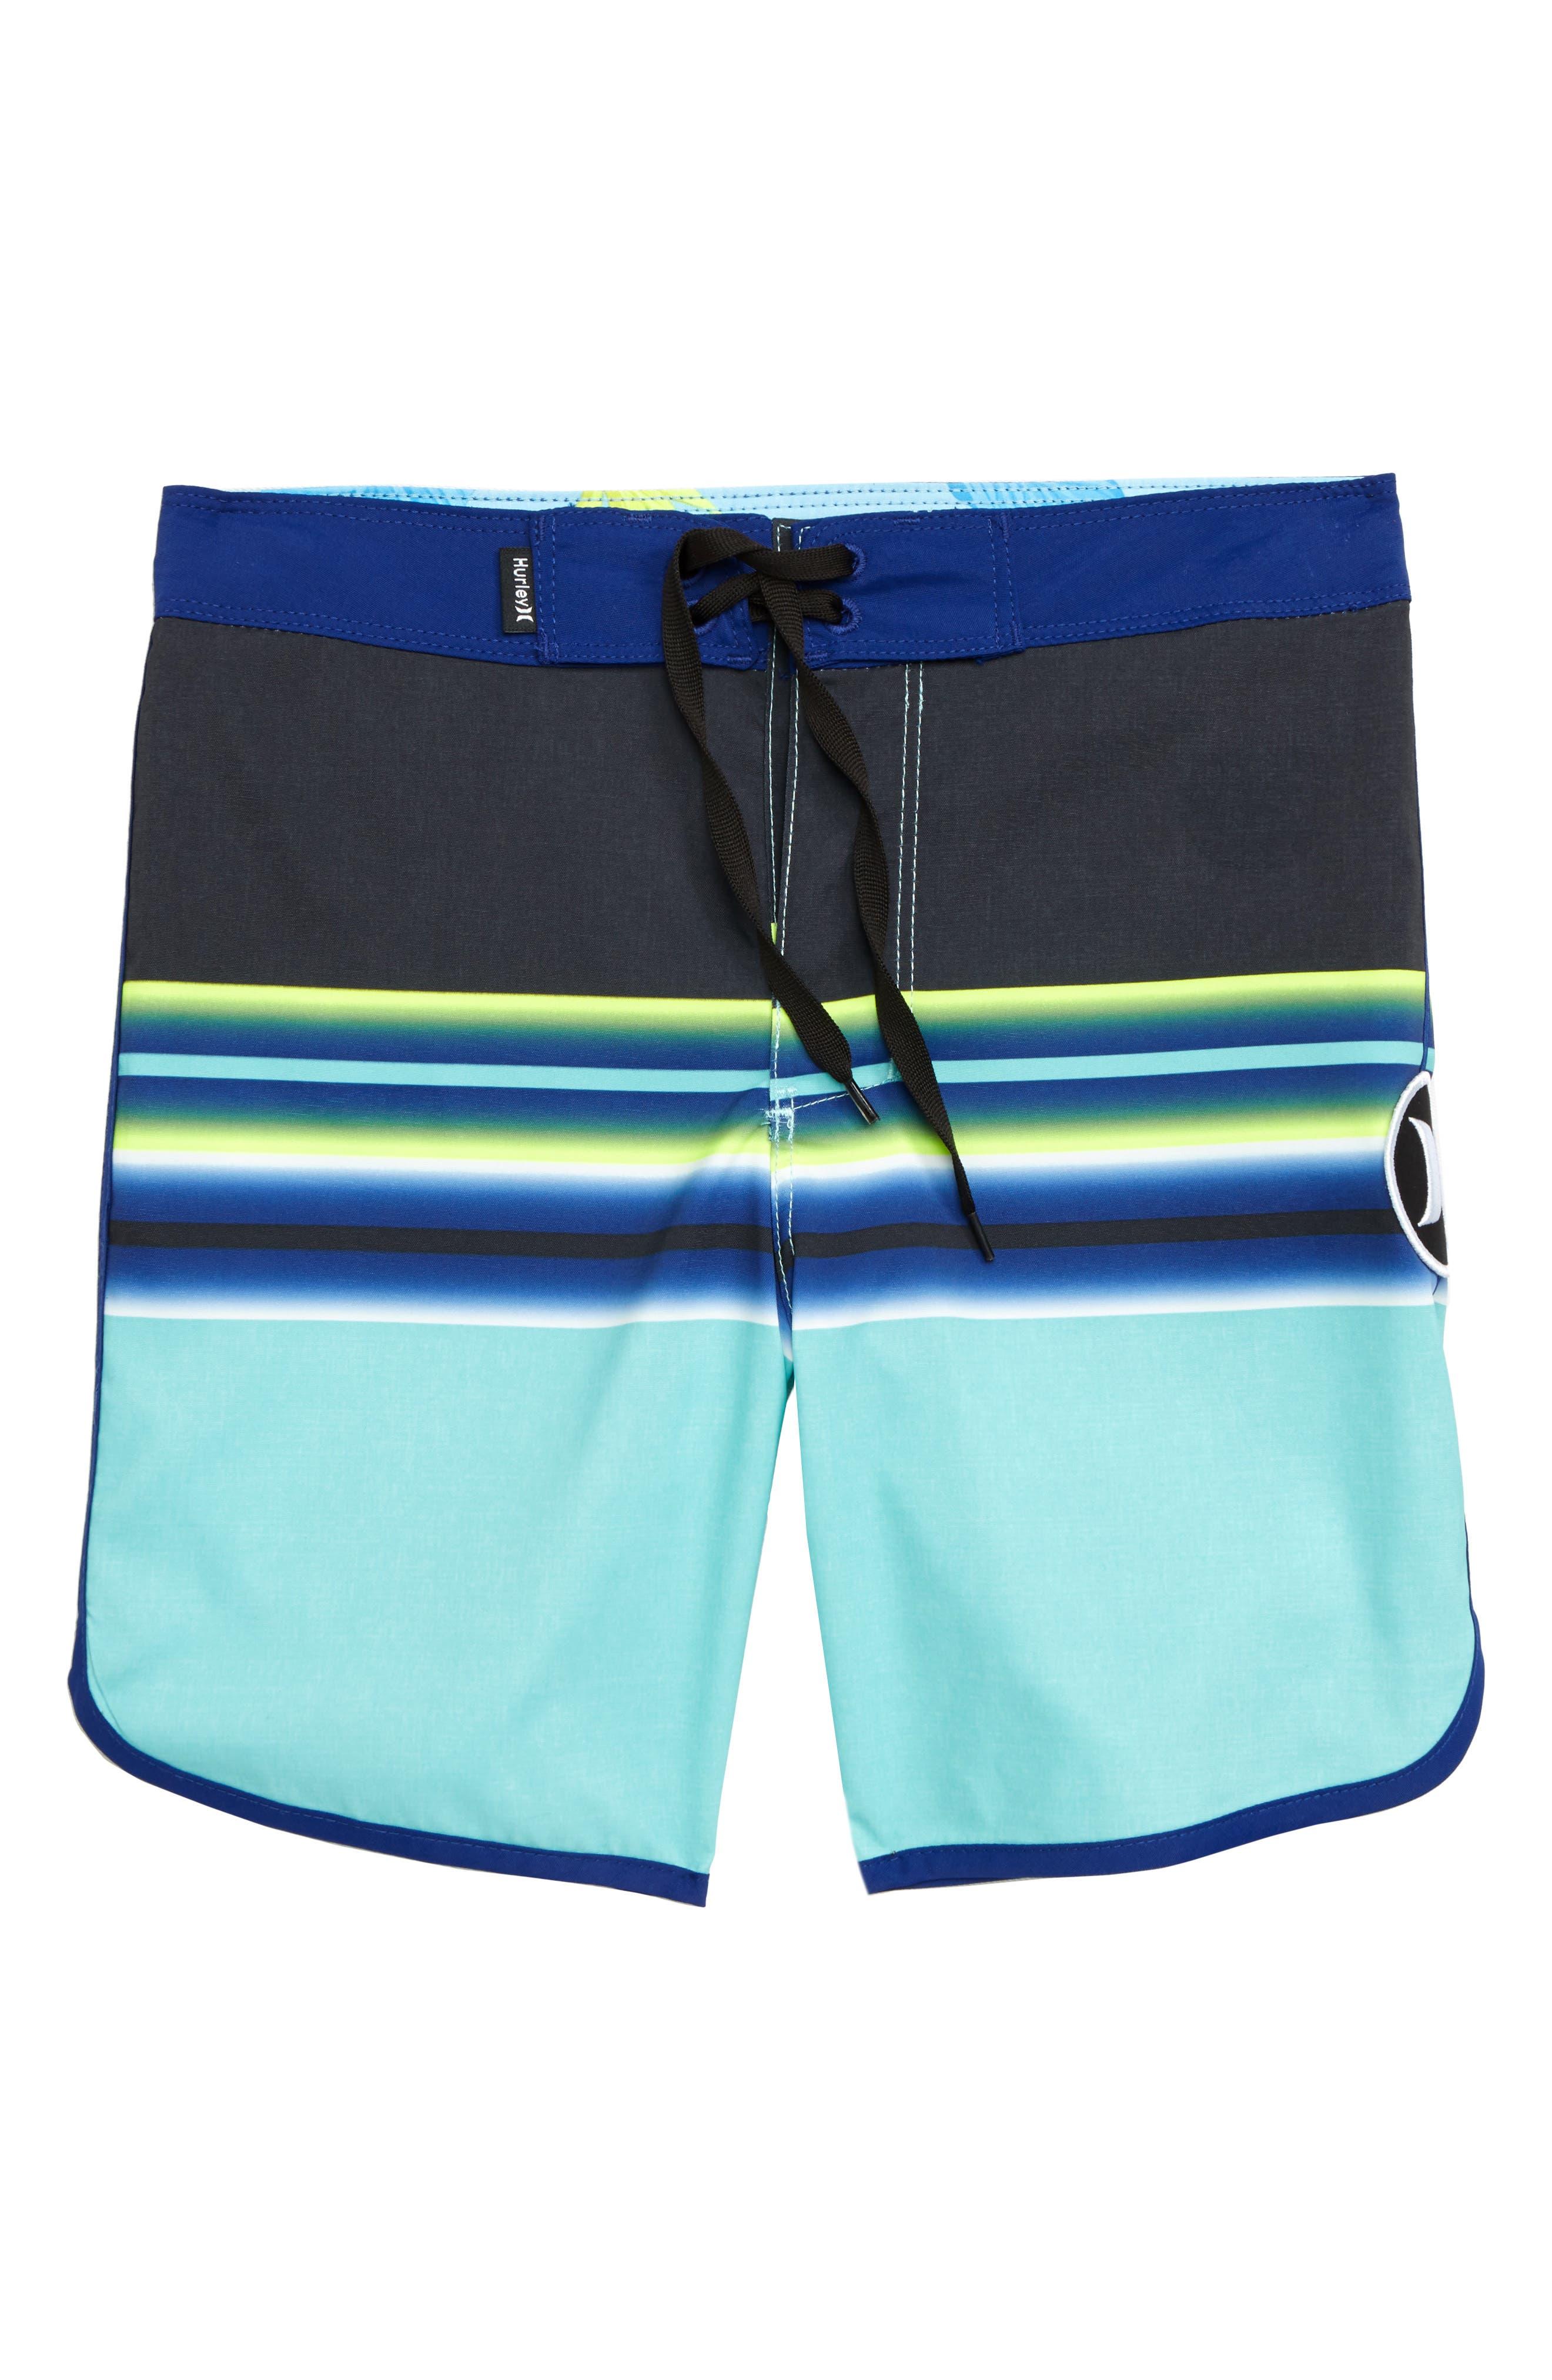 Zen Stripe Board Shorts,                             Main thumbnail 1, color,                             TROPICAL TWIST